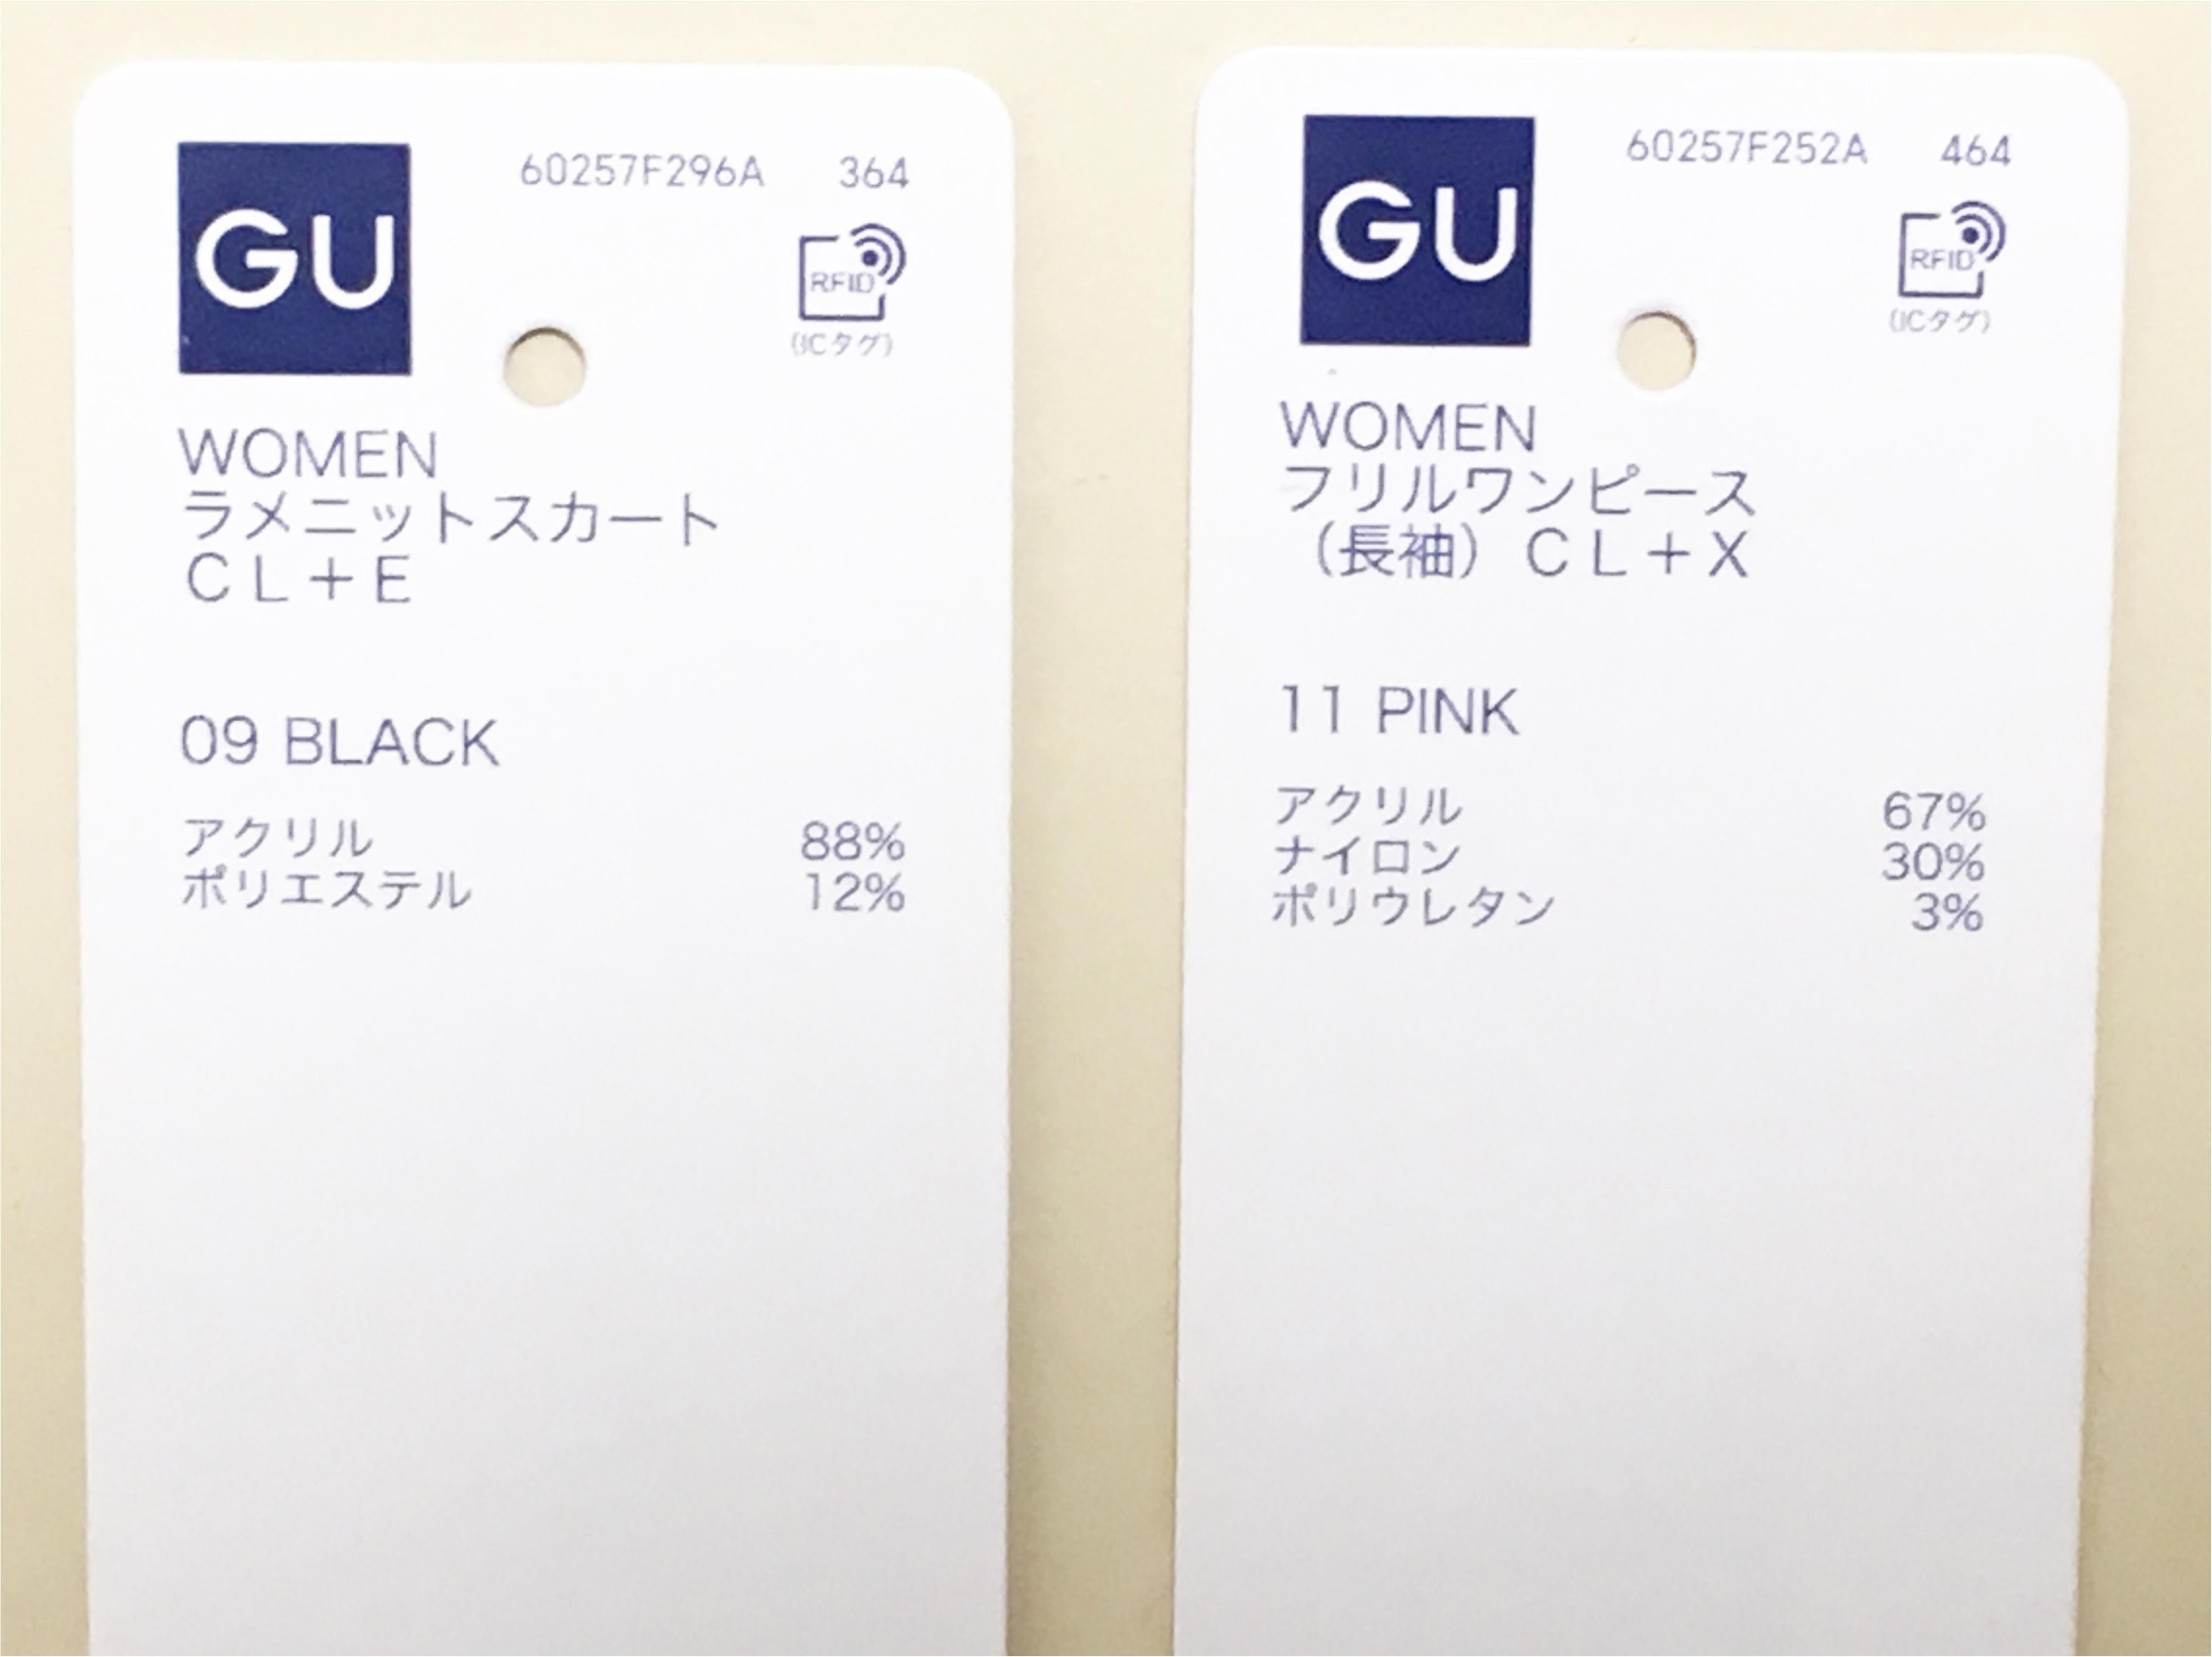 【GU(ジーユー)】全国に2店舗!「超」大型店へ。限定商品の見分け方、教えます。_5